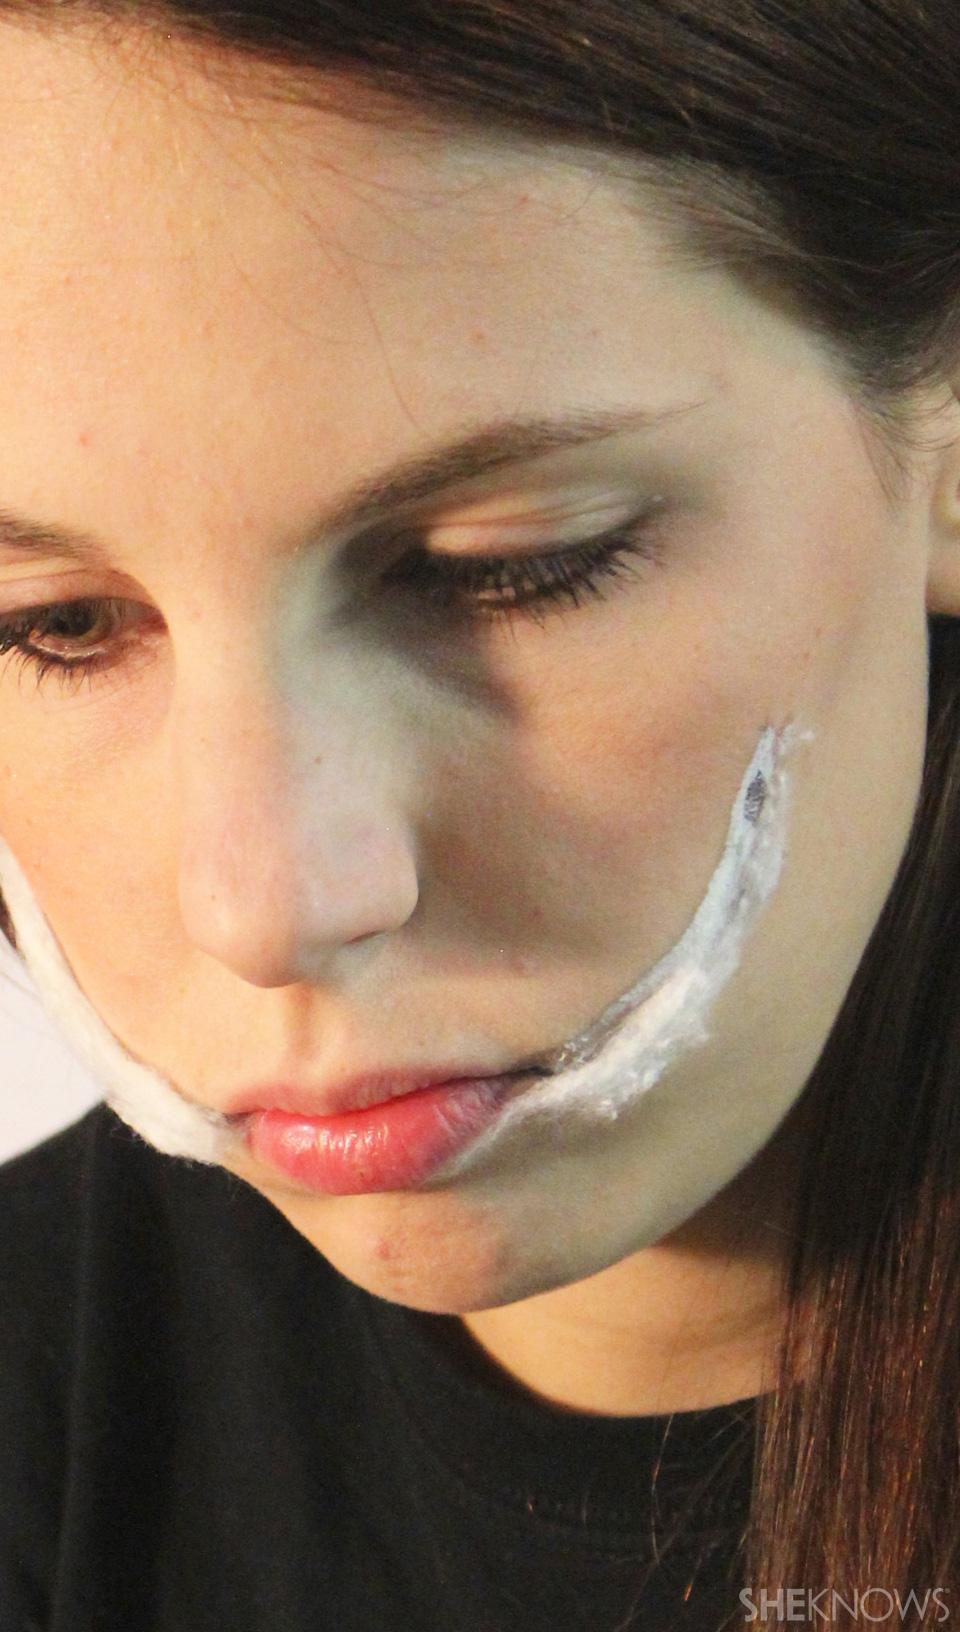 Freaky femme Joker makeup: Step 3